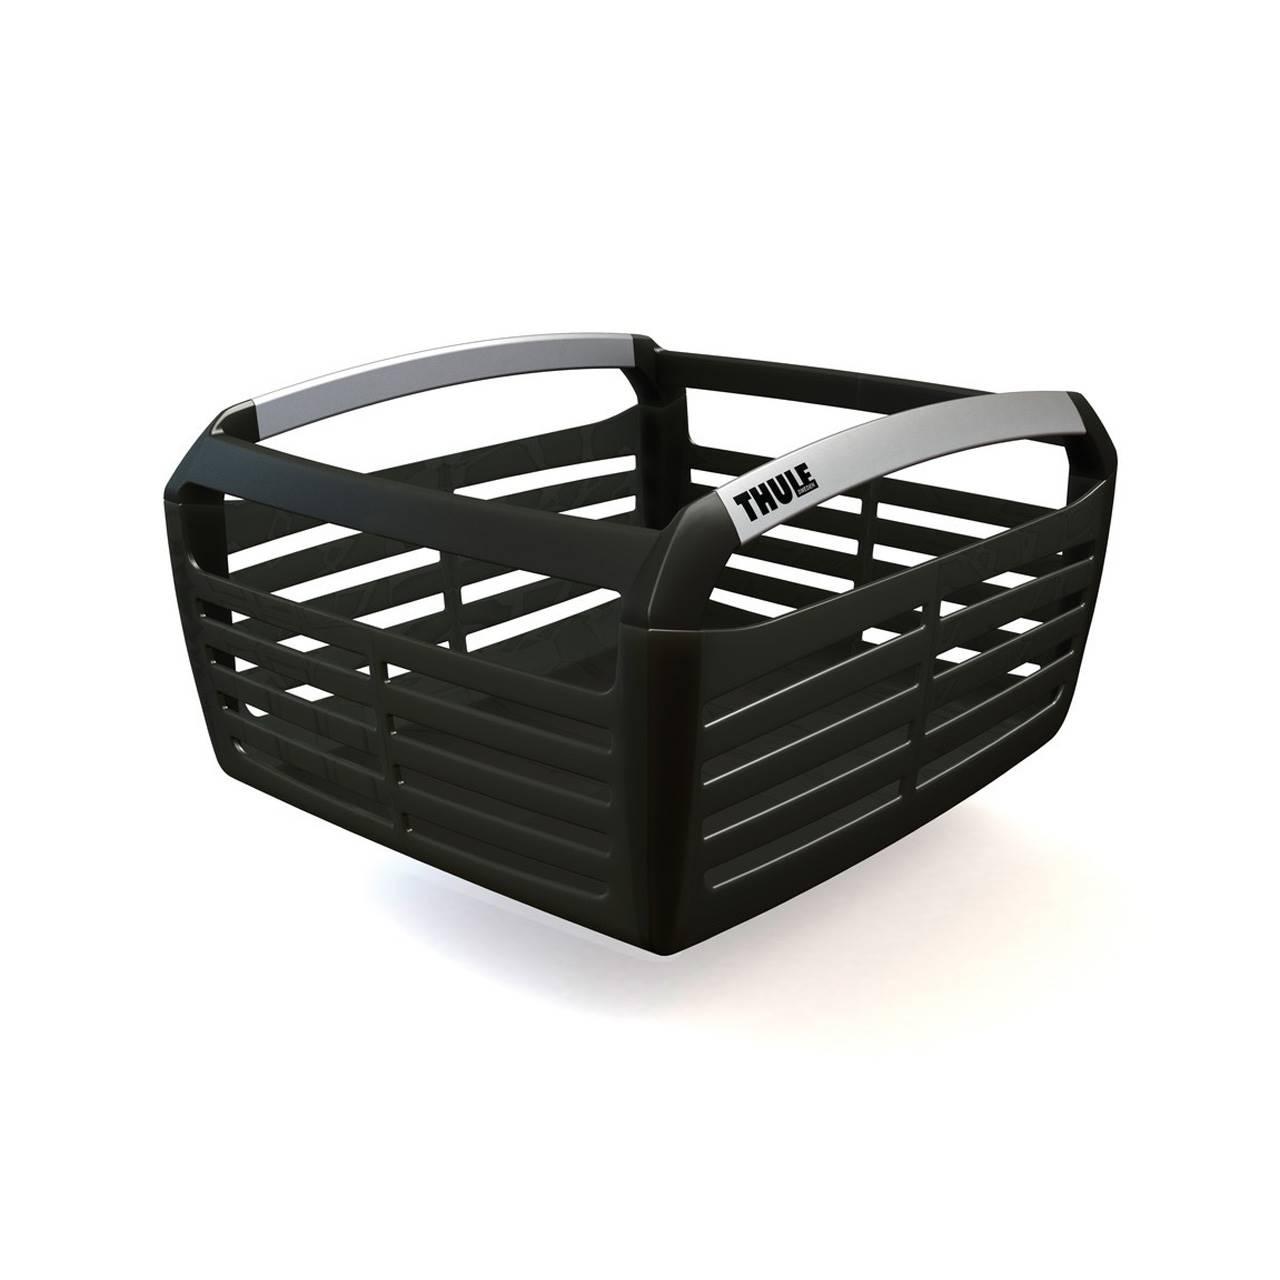 taschen k rbe f r e bikes pedelecs g nstig kaufen. Black Bedroom Furniture Sets. Home Design Ideas